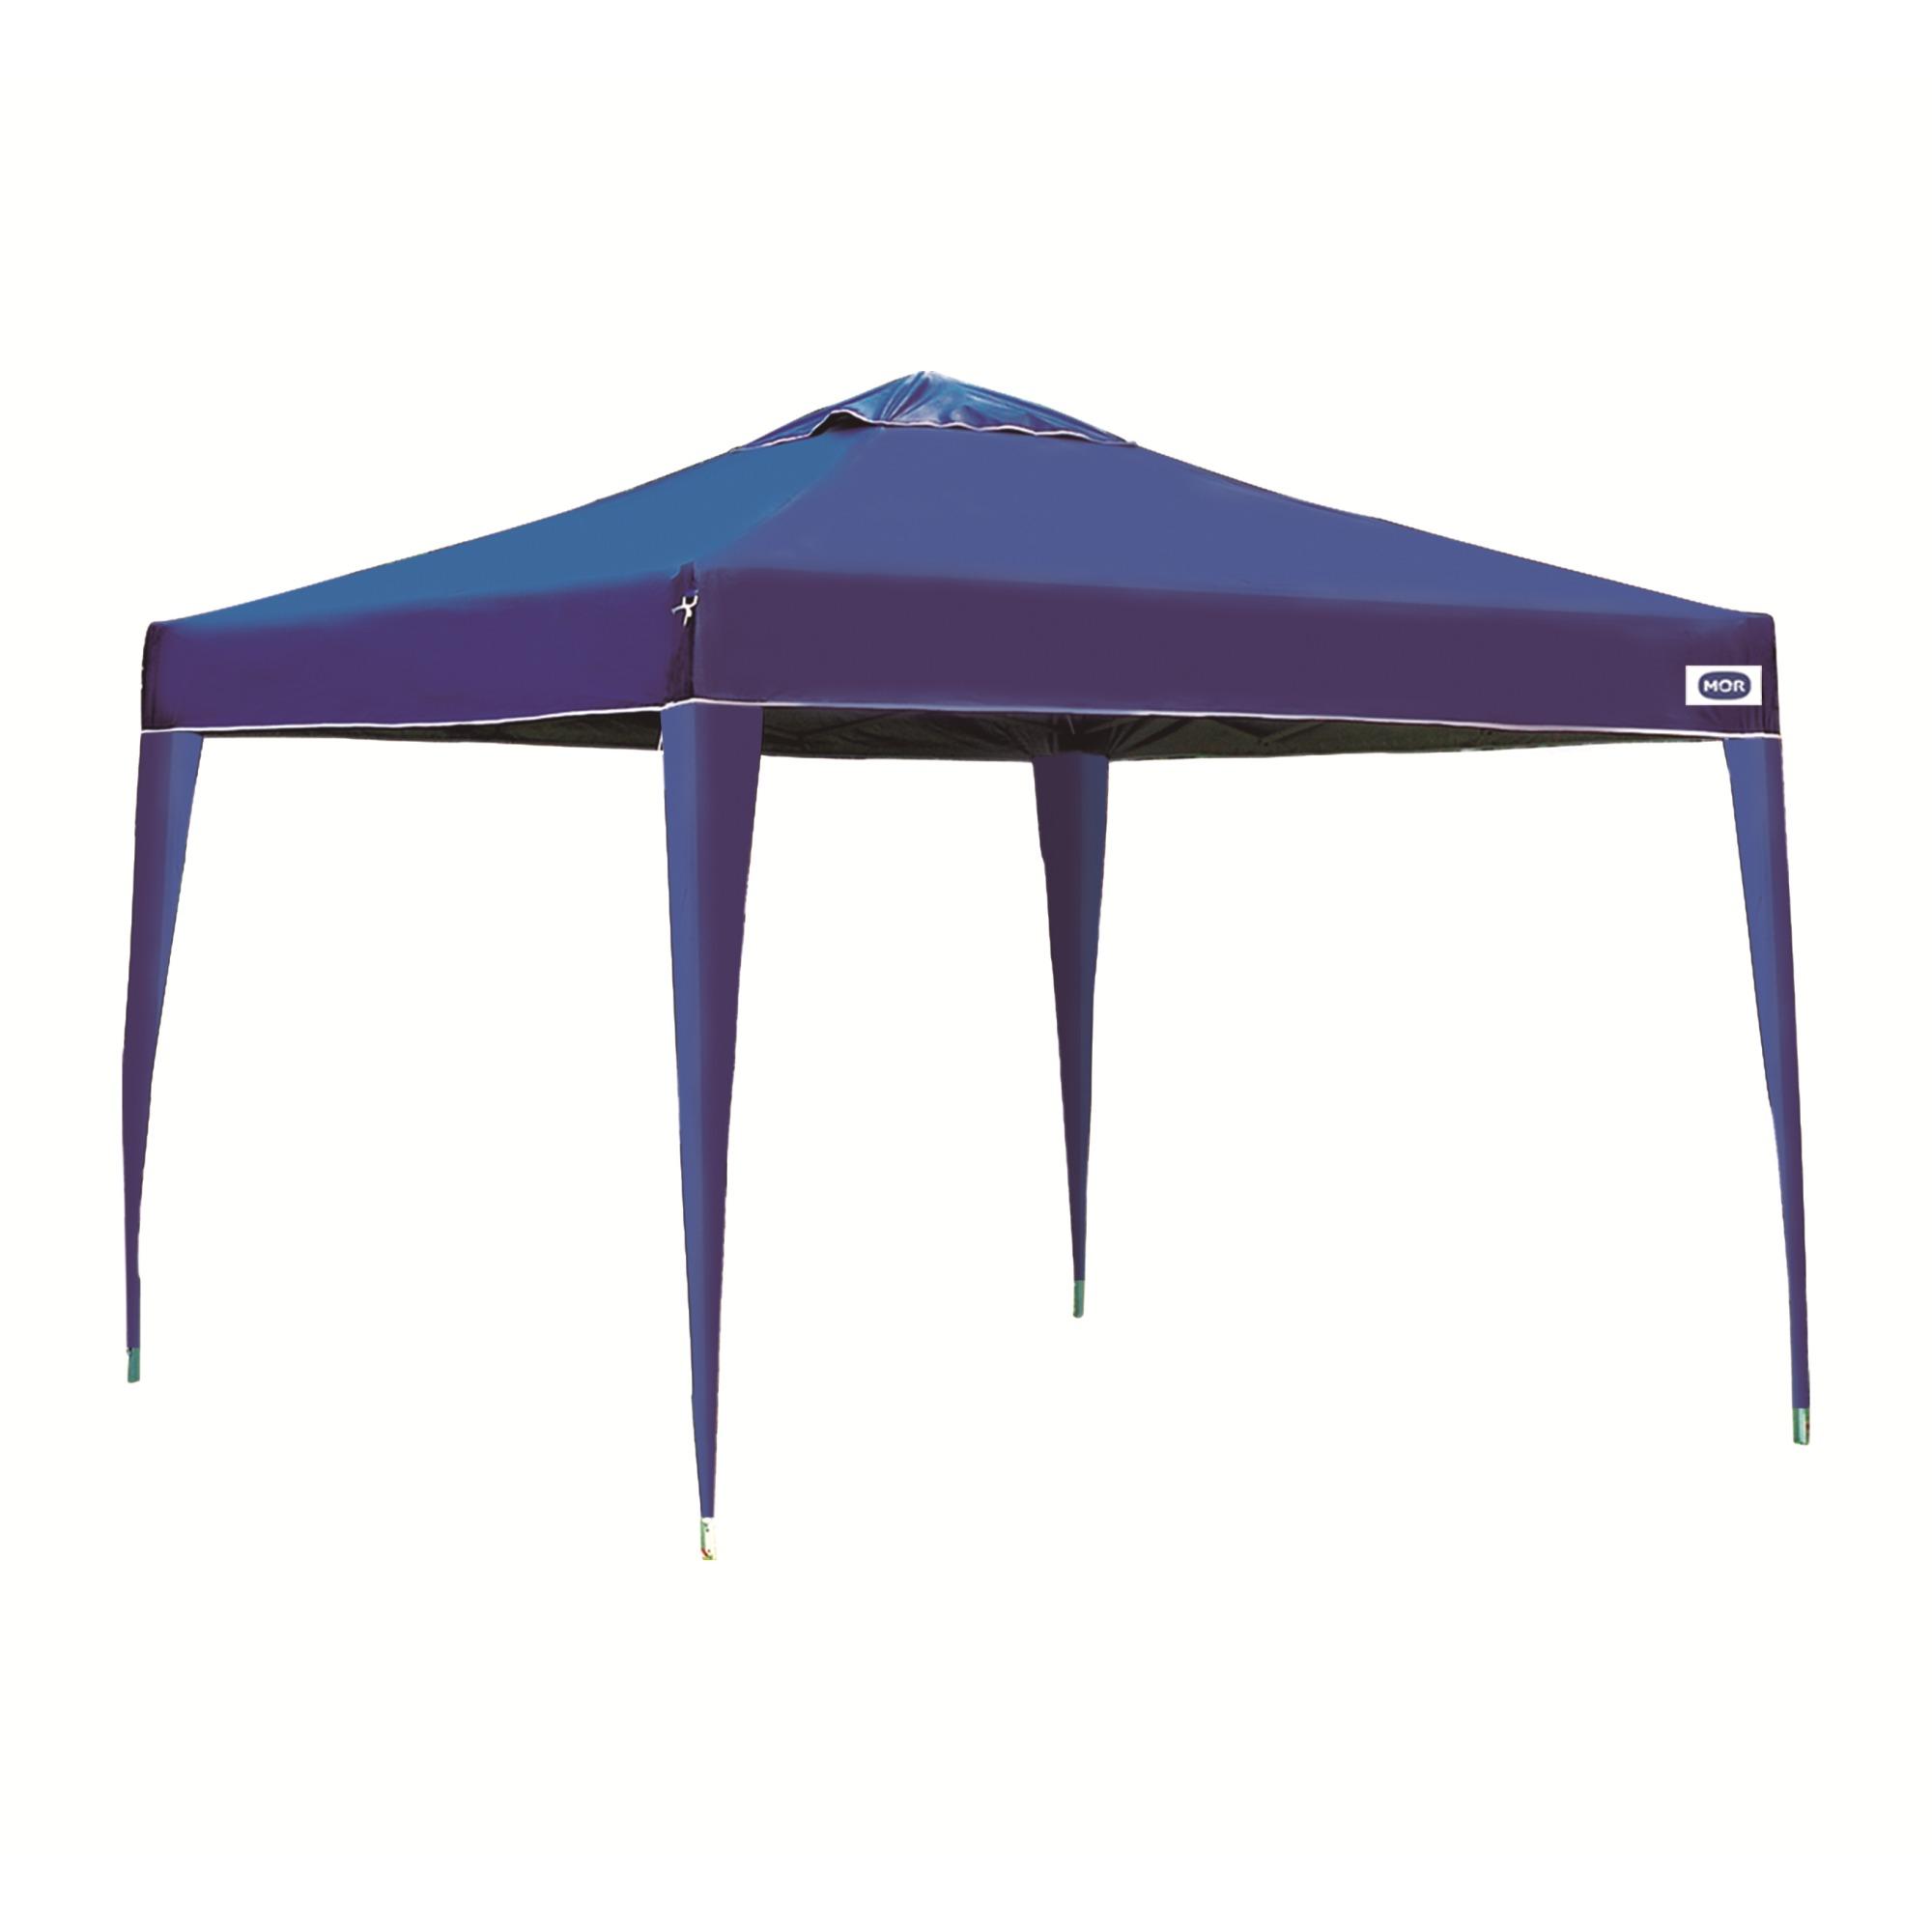 Tenda 30x30m Impermeavel Poliester Azul Escuro - Mor